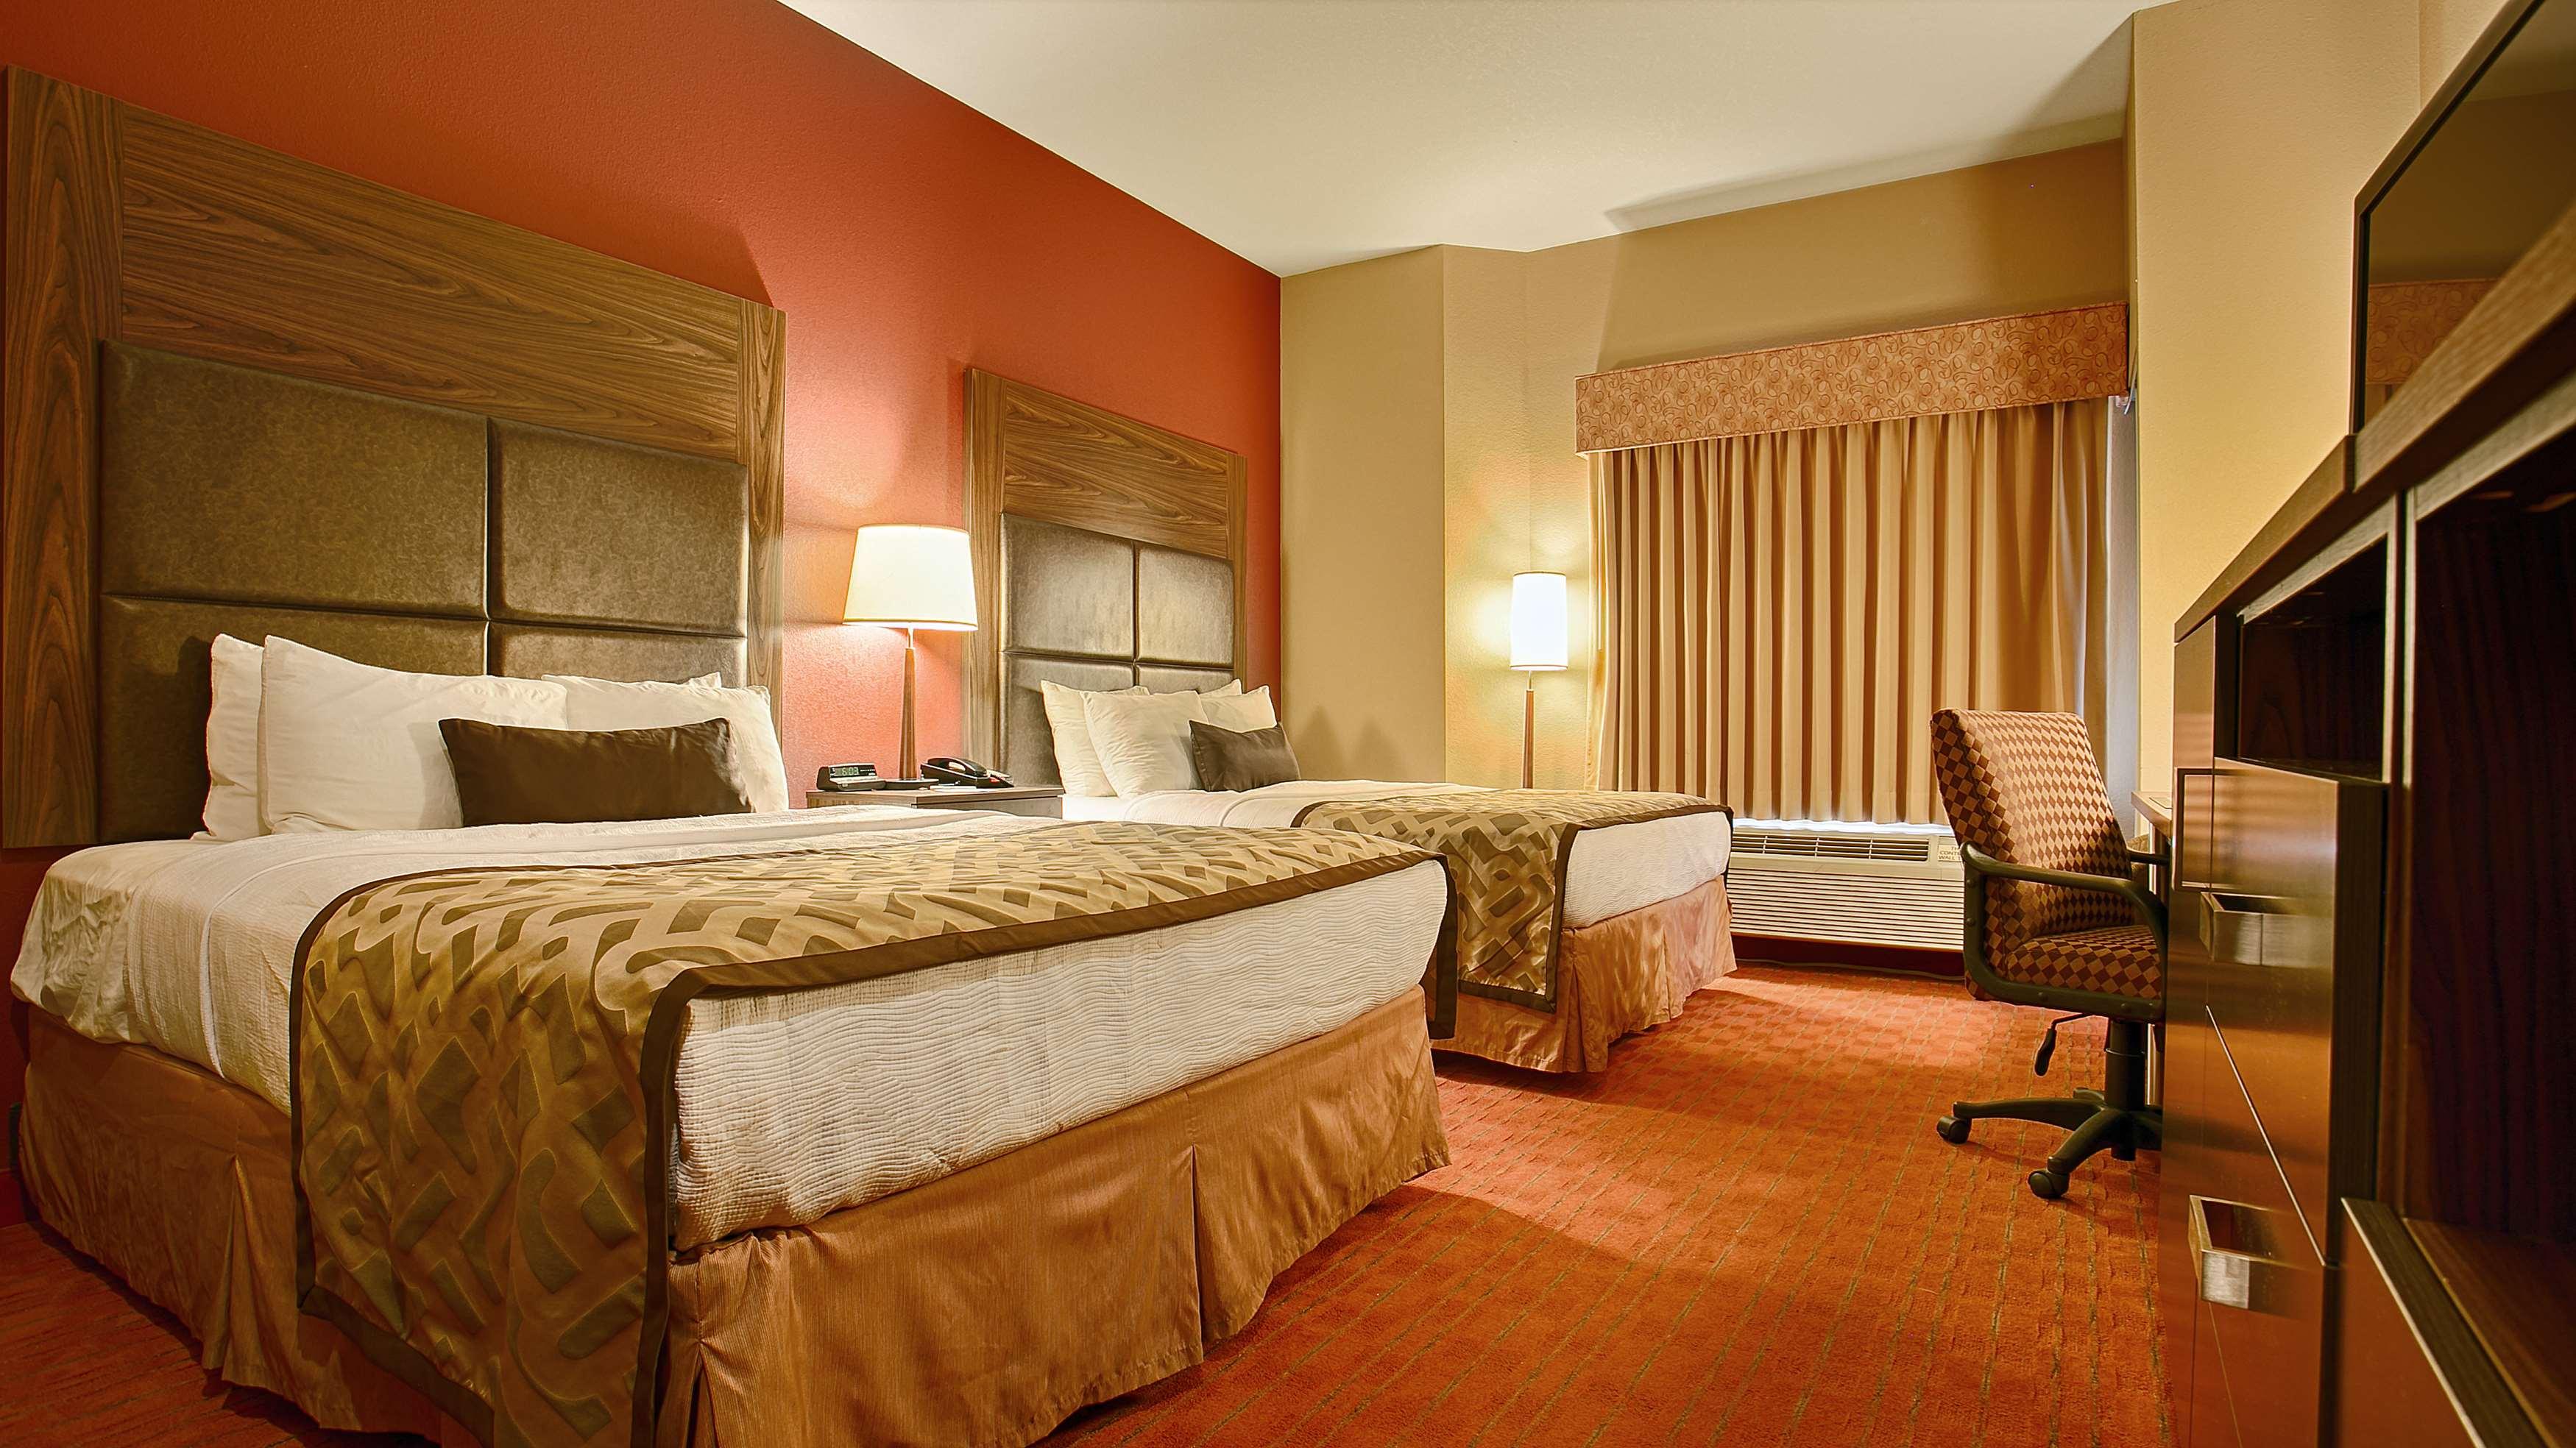 Best Western Plus Woodland Hills Hotel & Suites image 23